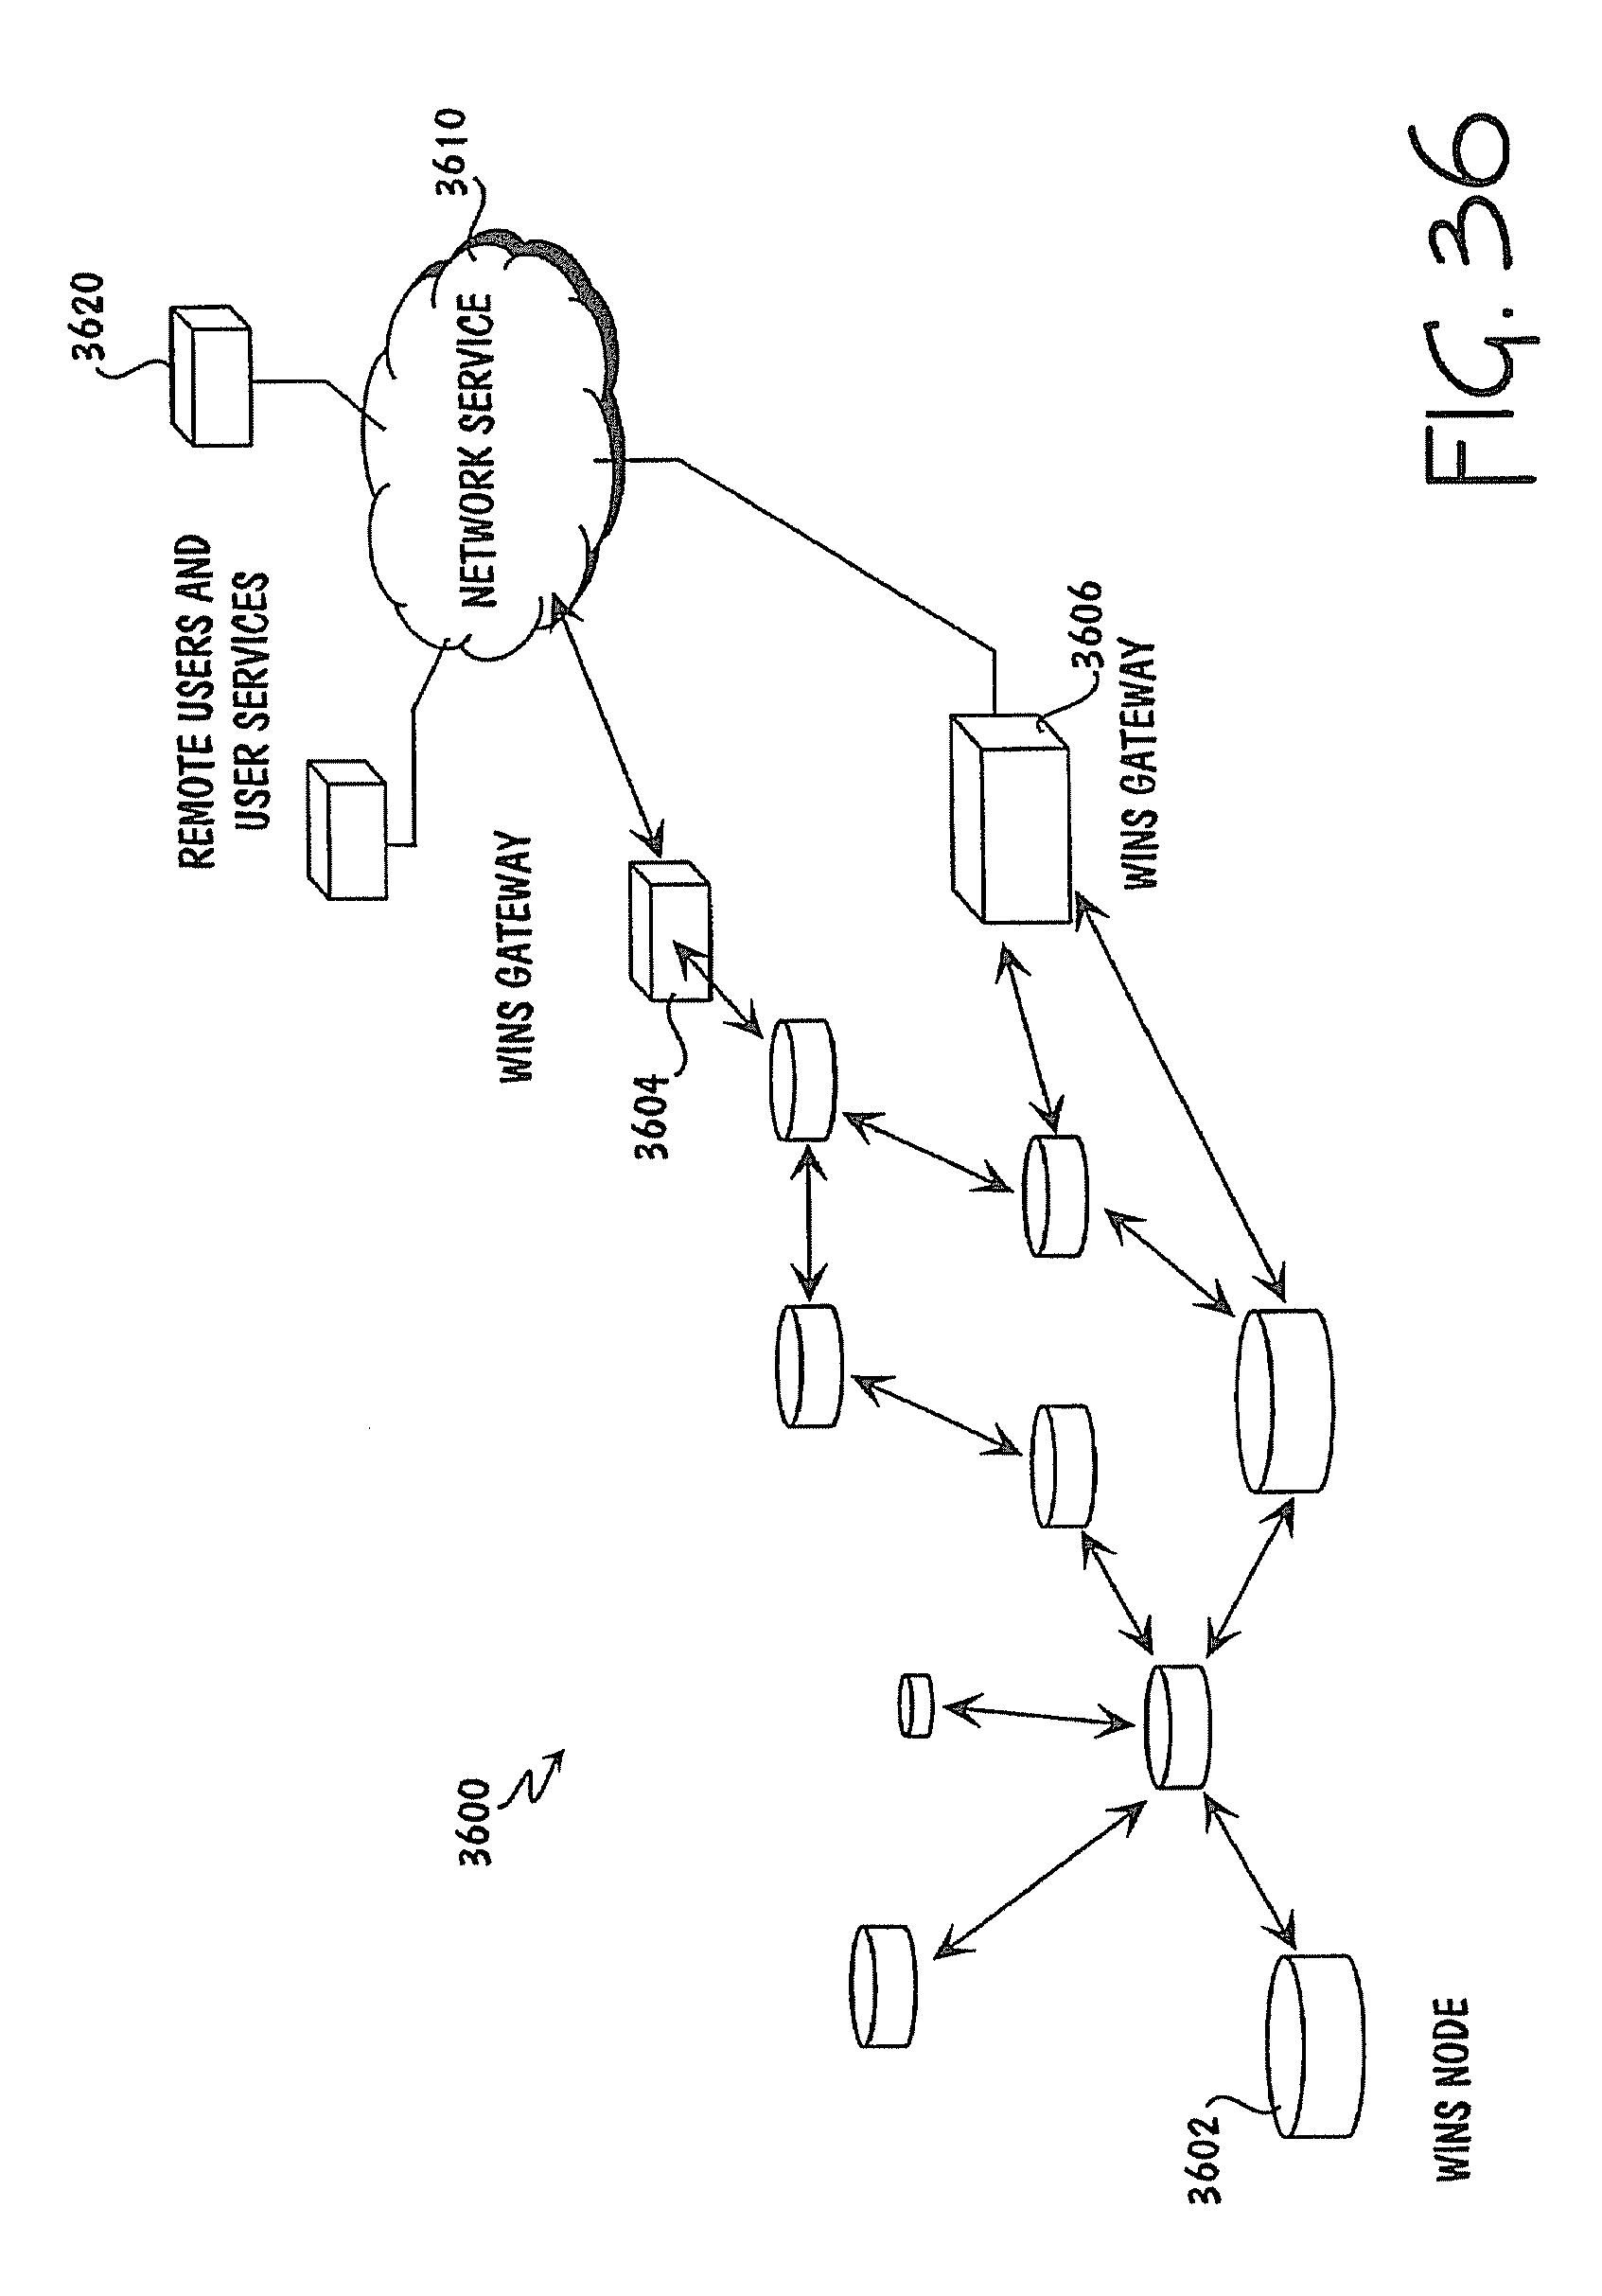 Patent US 8,836,503 B2